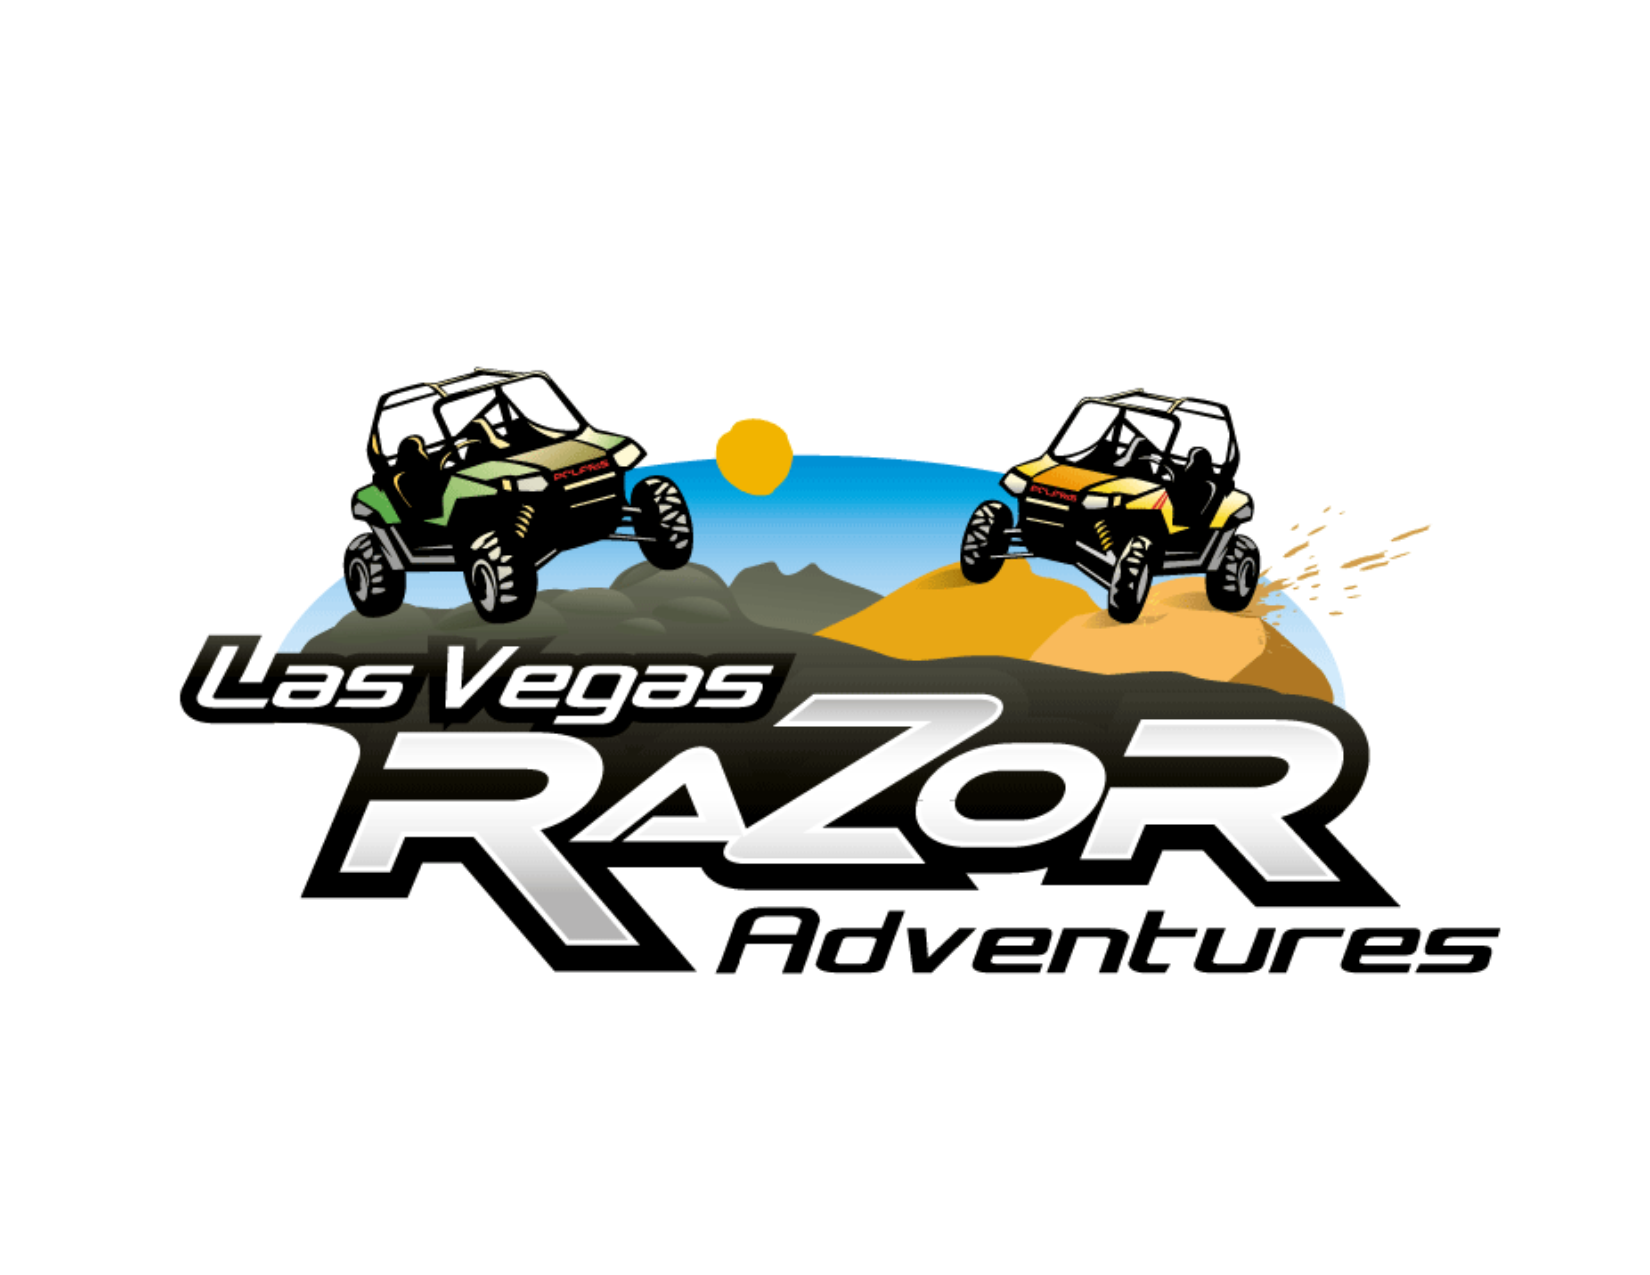 Las Vegas RaZoR Adventures